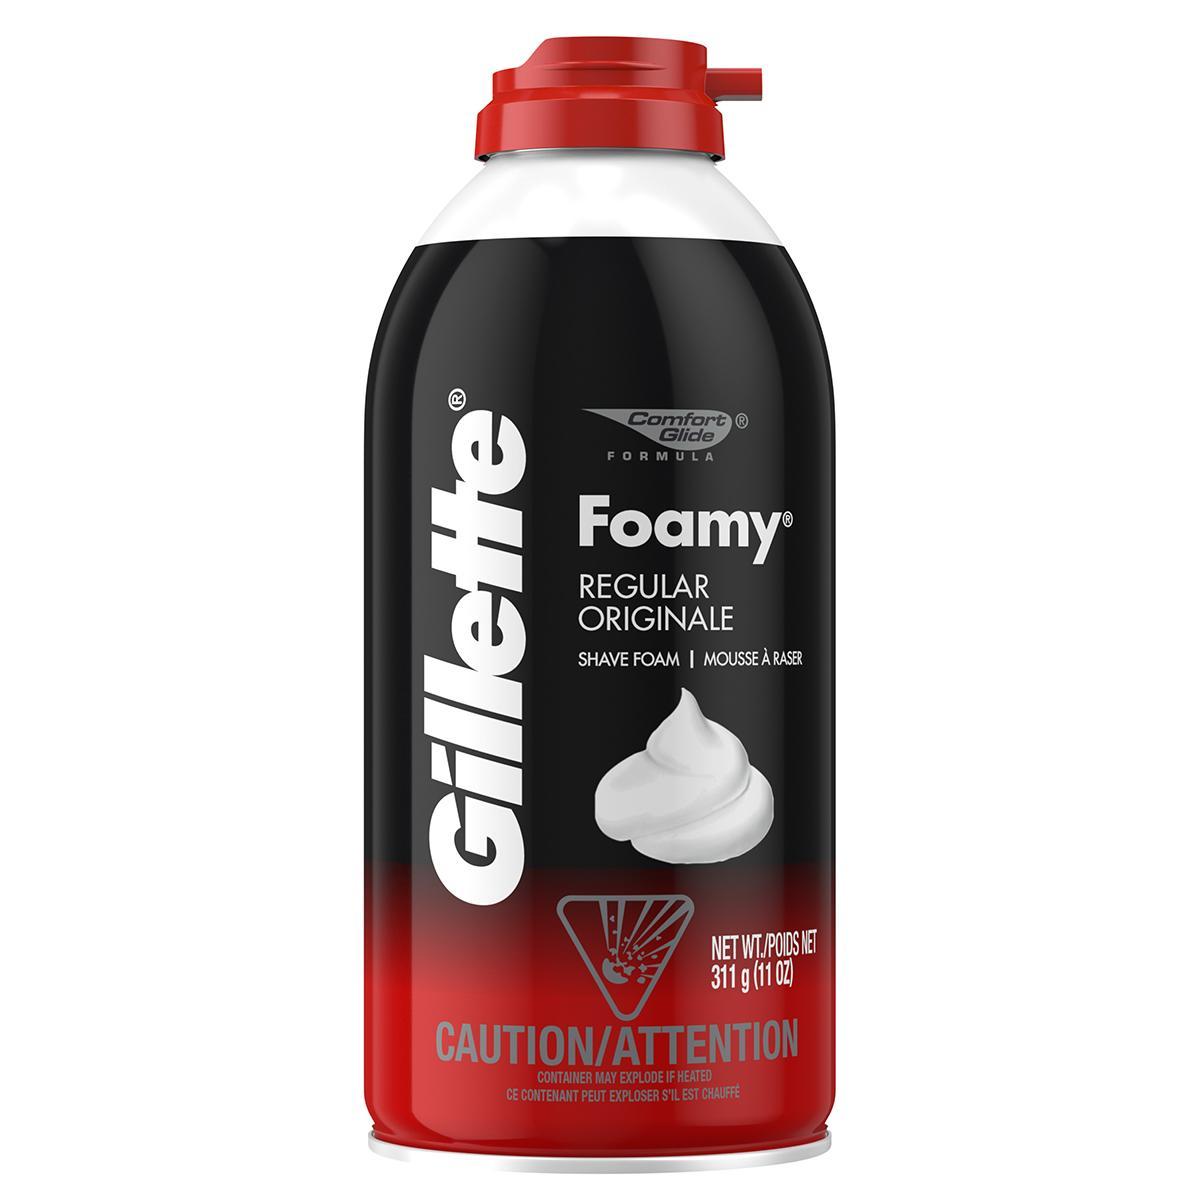 Kem cạo râu Gillette Regular Originale 311g (nhập khẩu mỹ) - Đỏ cao cấp